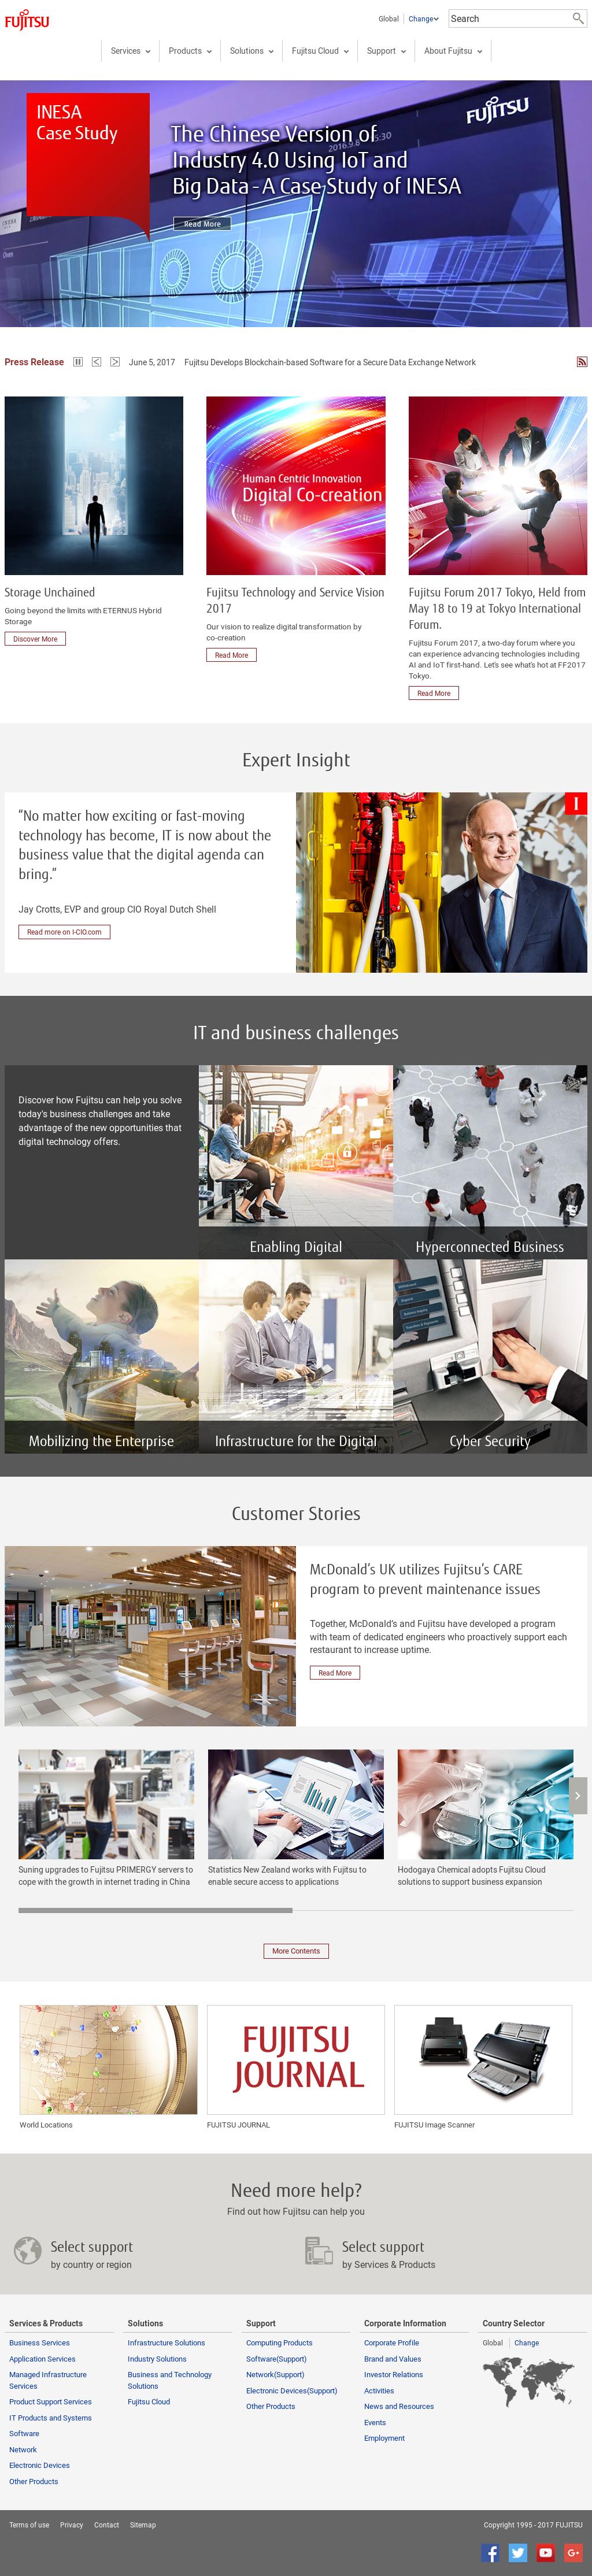 Fujitsu Competitors, Revenue and Employees - Owler Company Profile